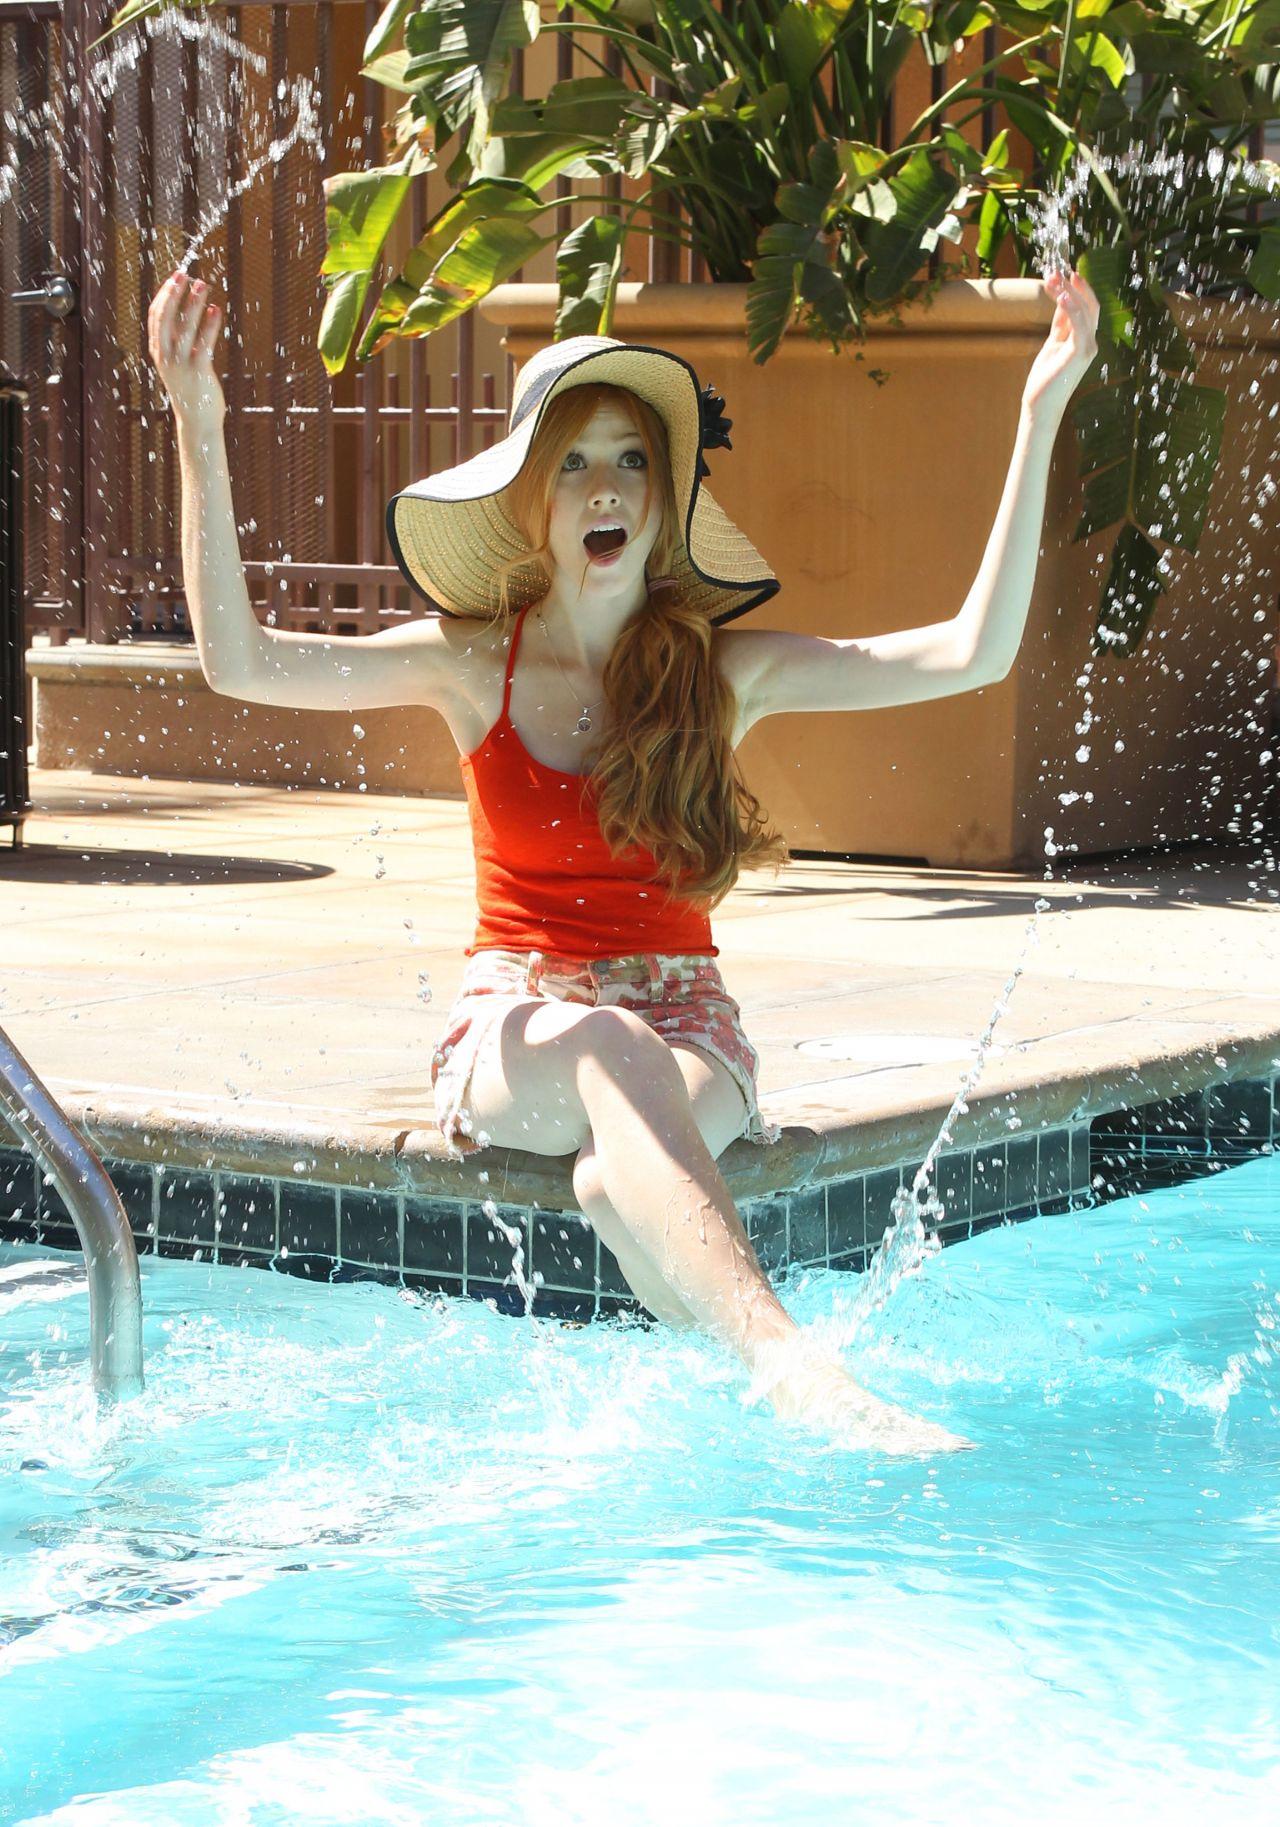 Katherine Mcnamara Photoshoot By A Pool In Los Angeles